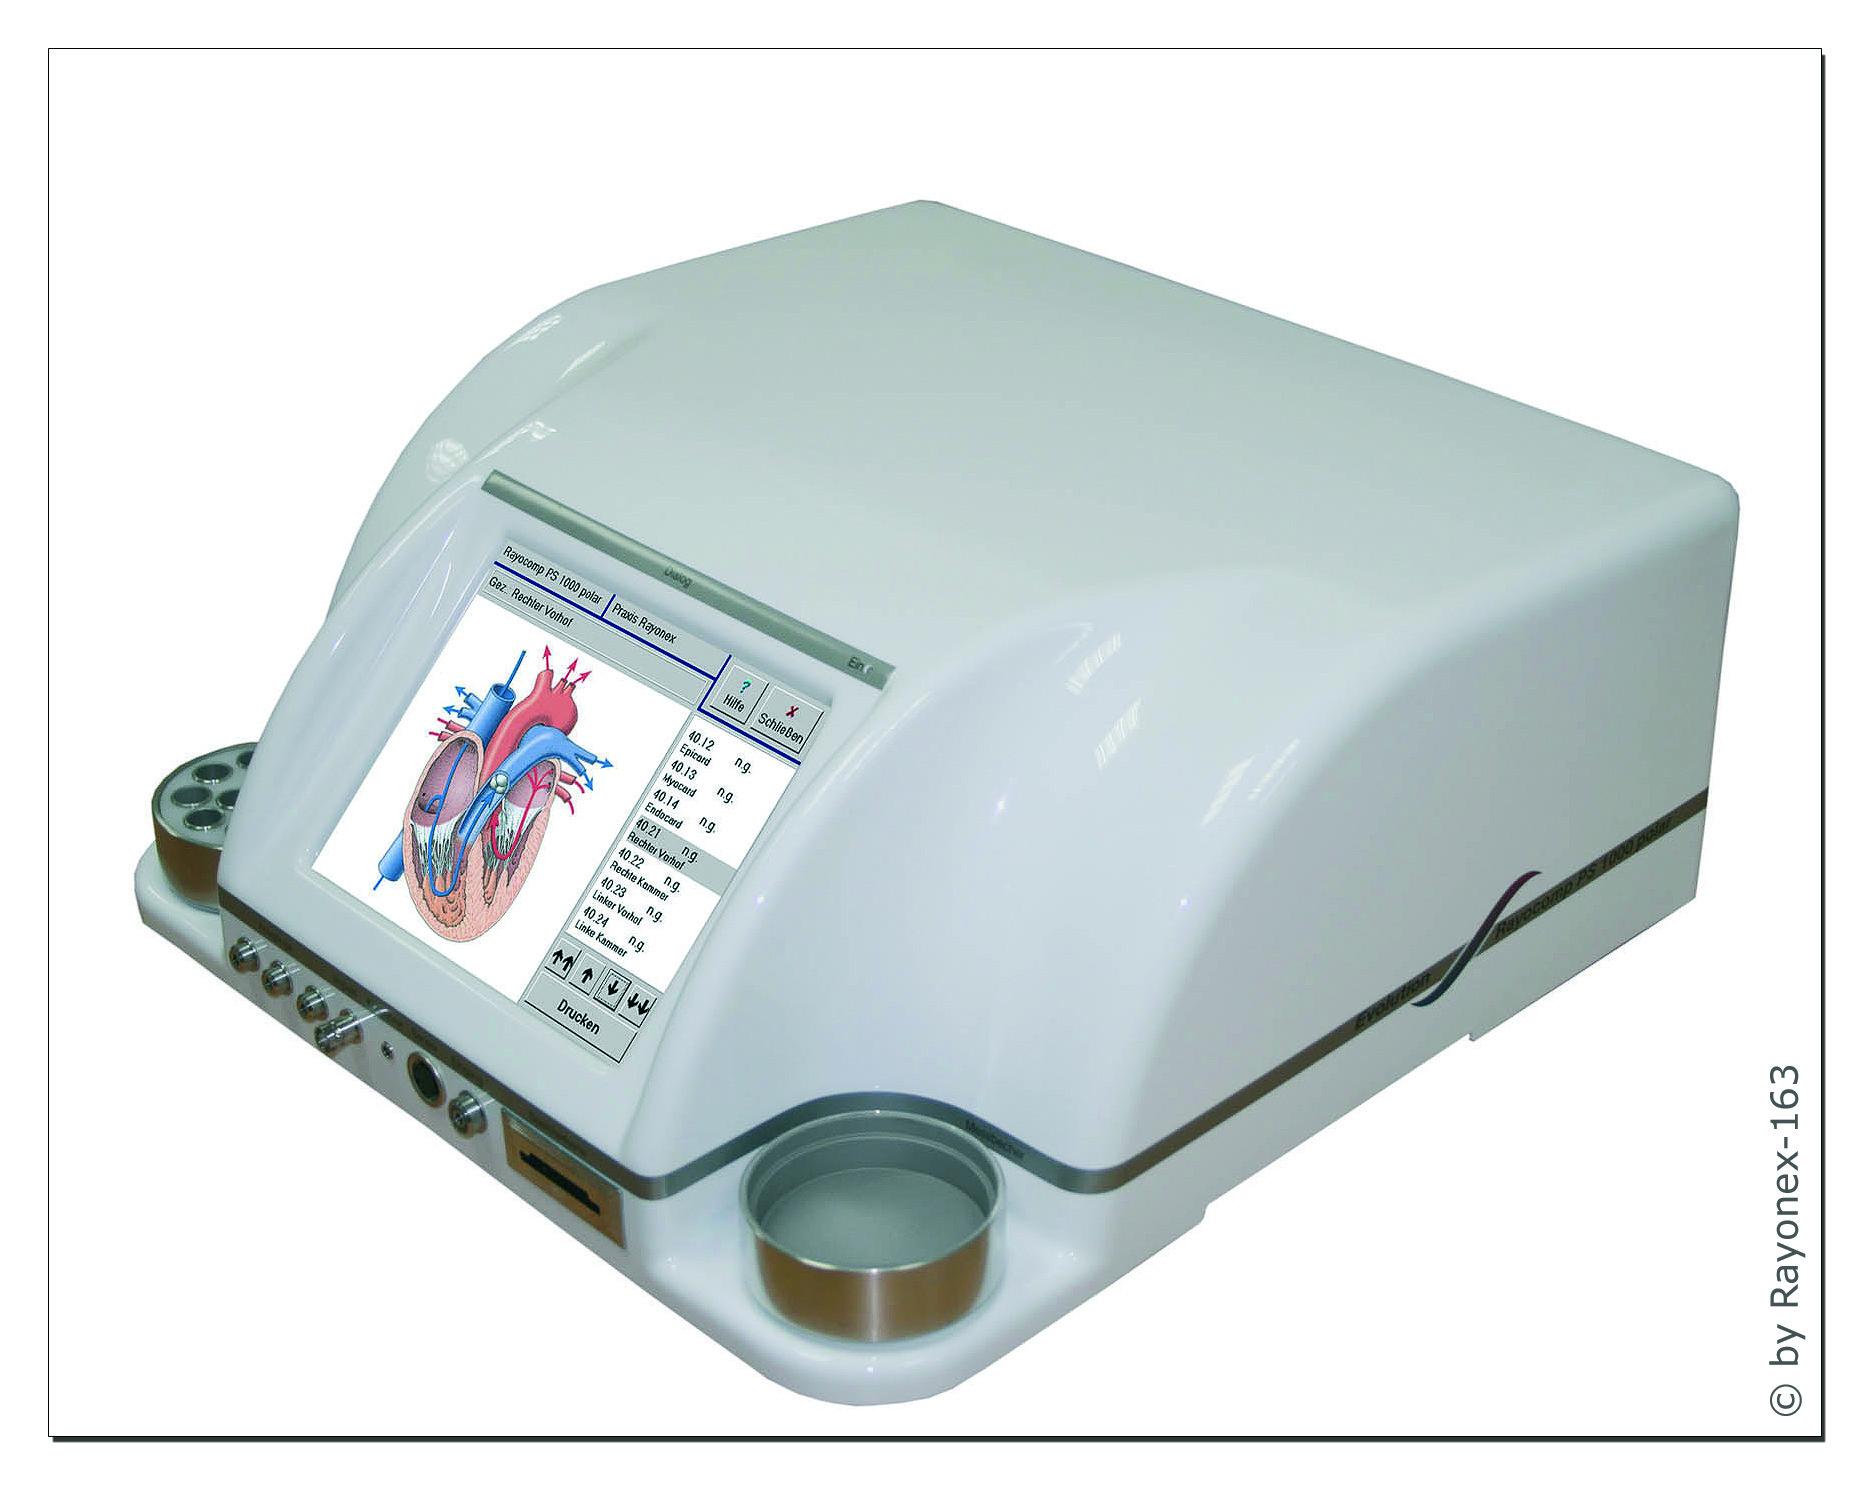 Rayonex Polar Prämium Bioresonanzgerät